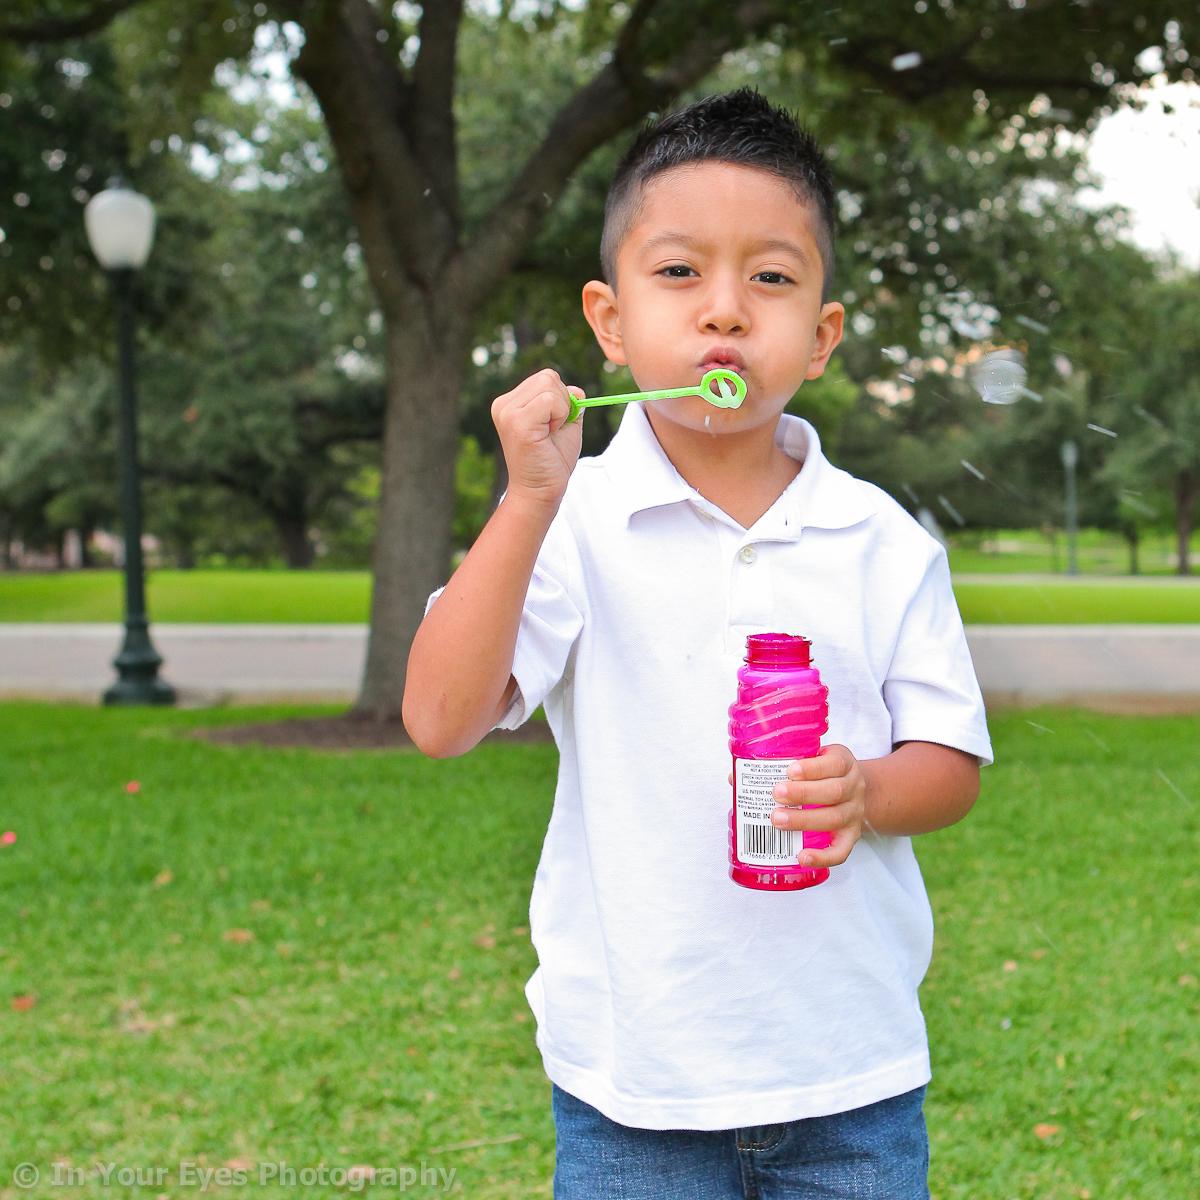 boy blowing bubbles Austin, Texas family portraits family photographers